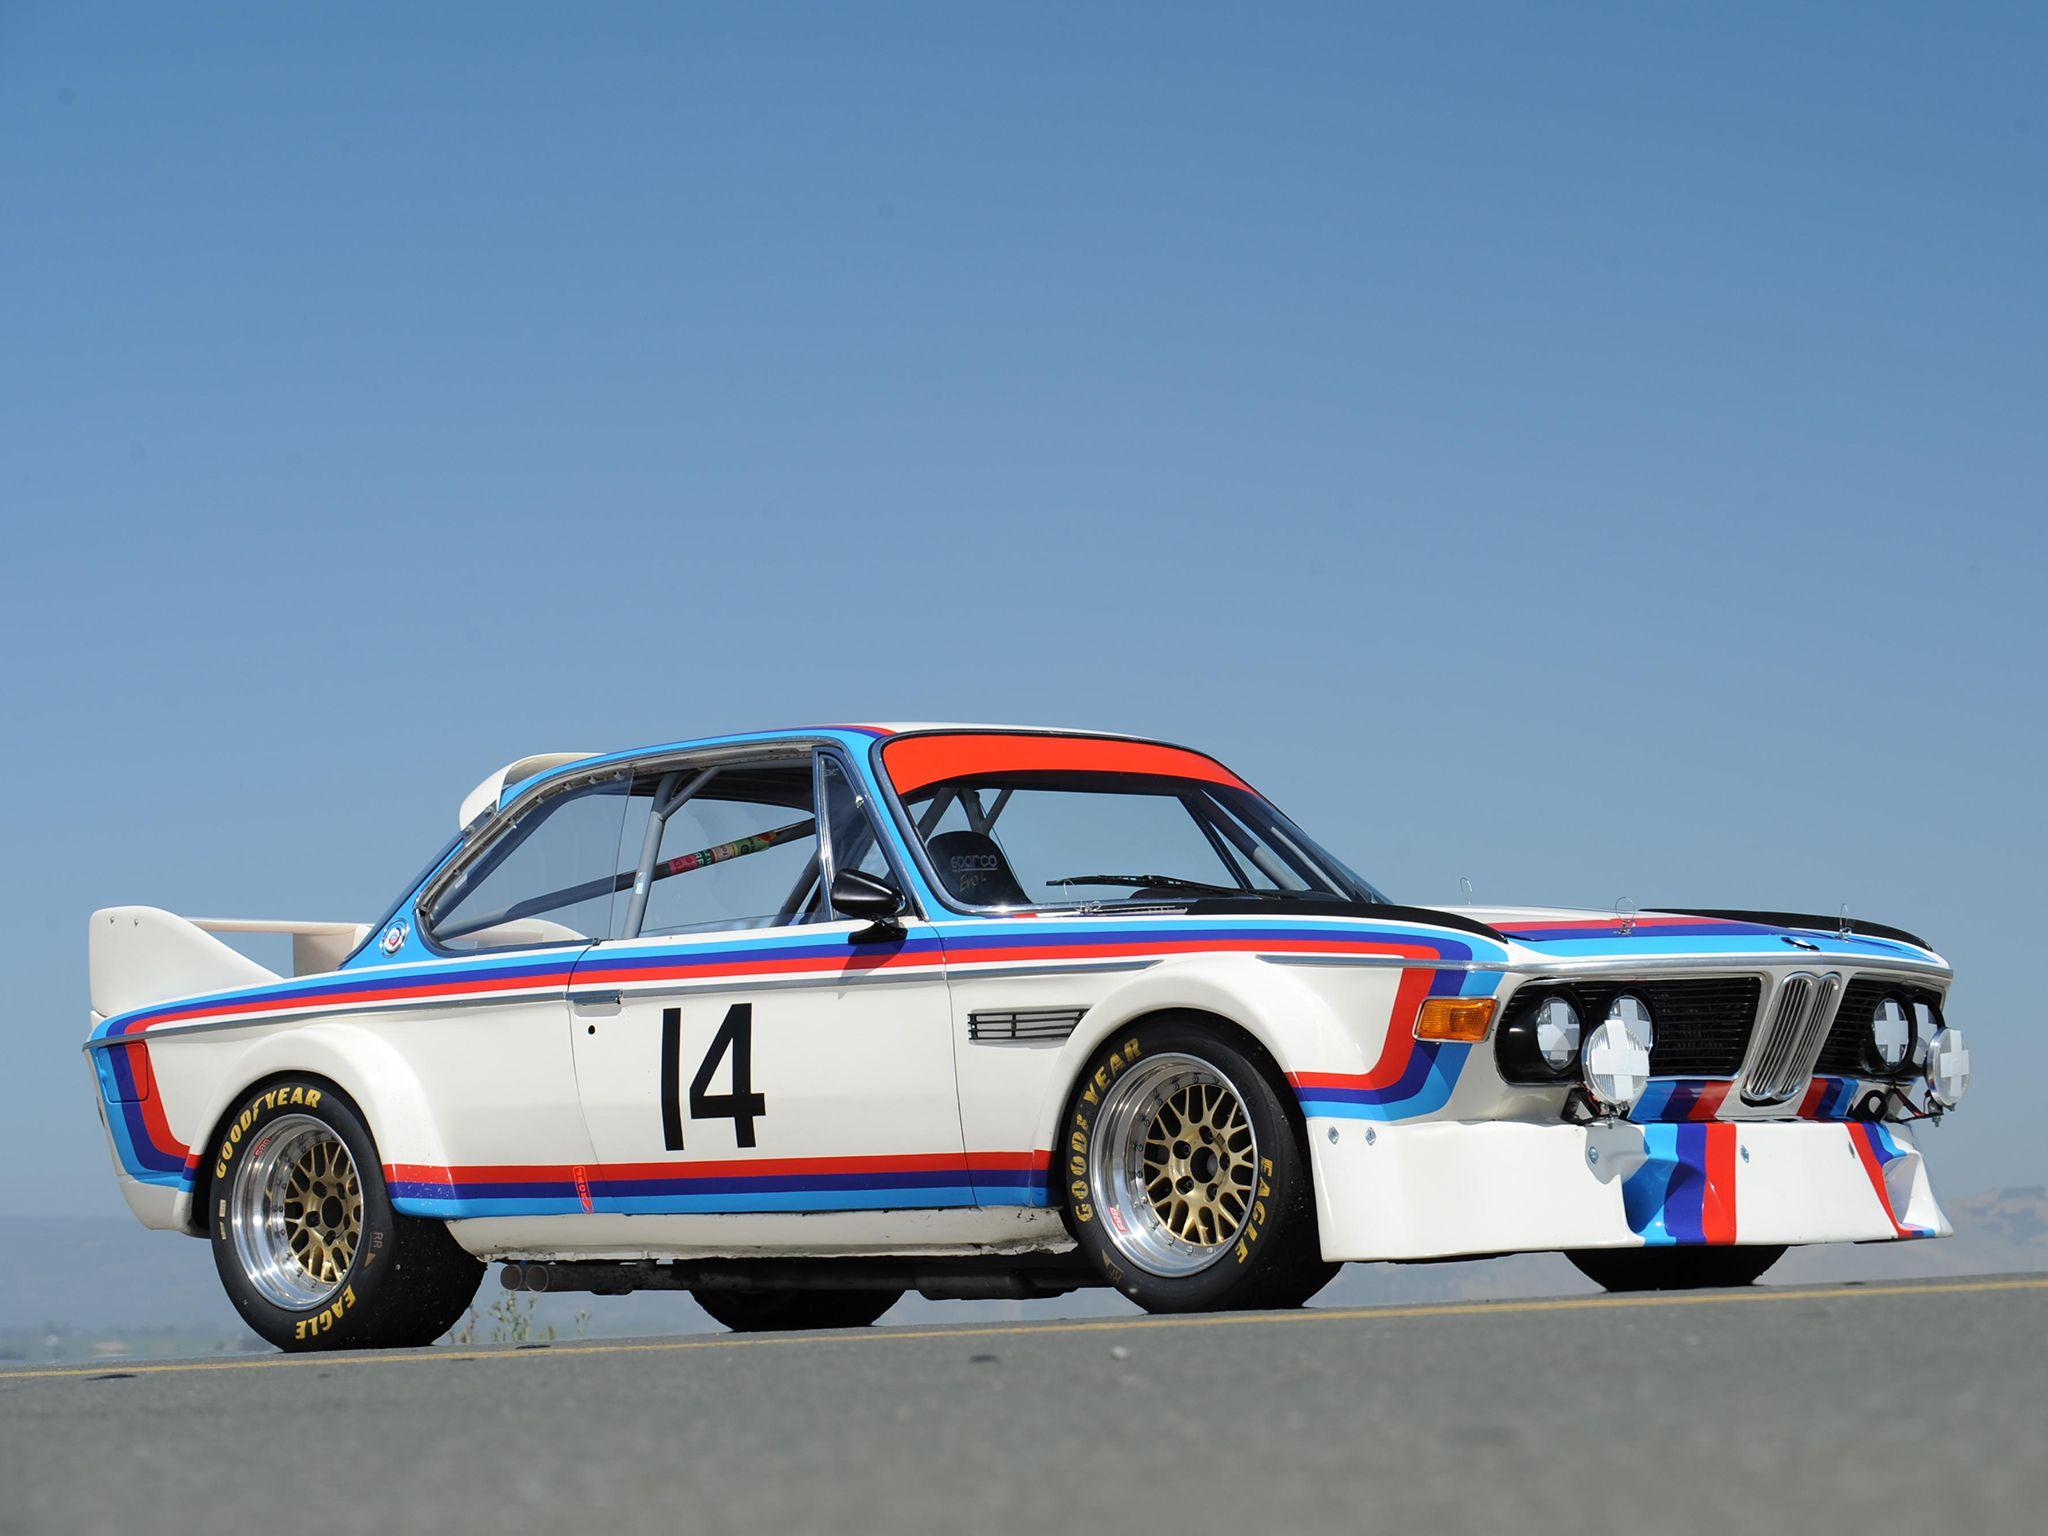 1973 75 Bmw 3 0 Csl Gruppe 2 Competition Coupe E9 Bmw E9 Bmw